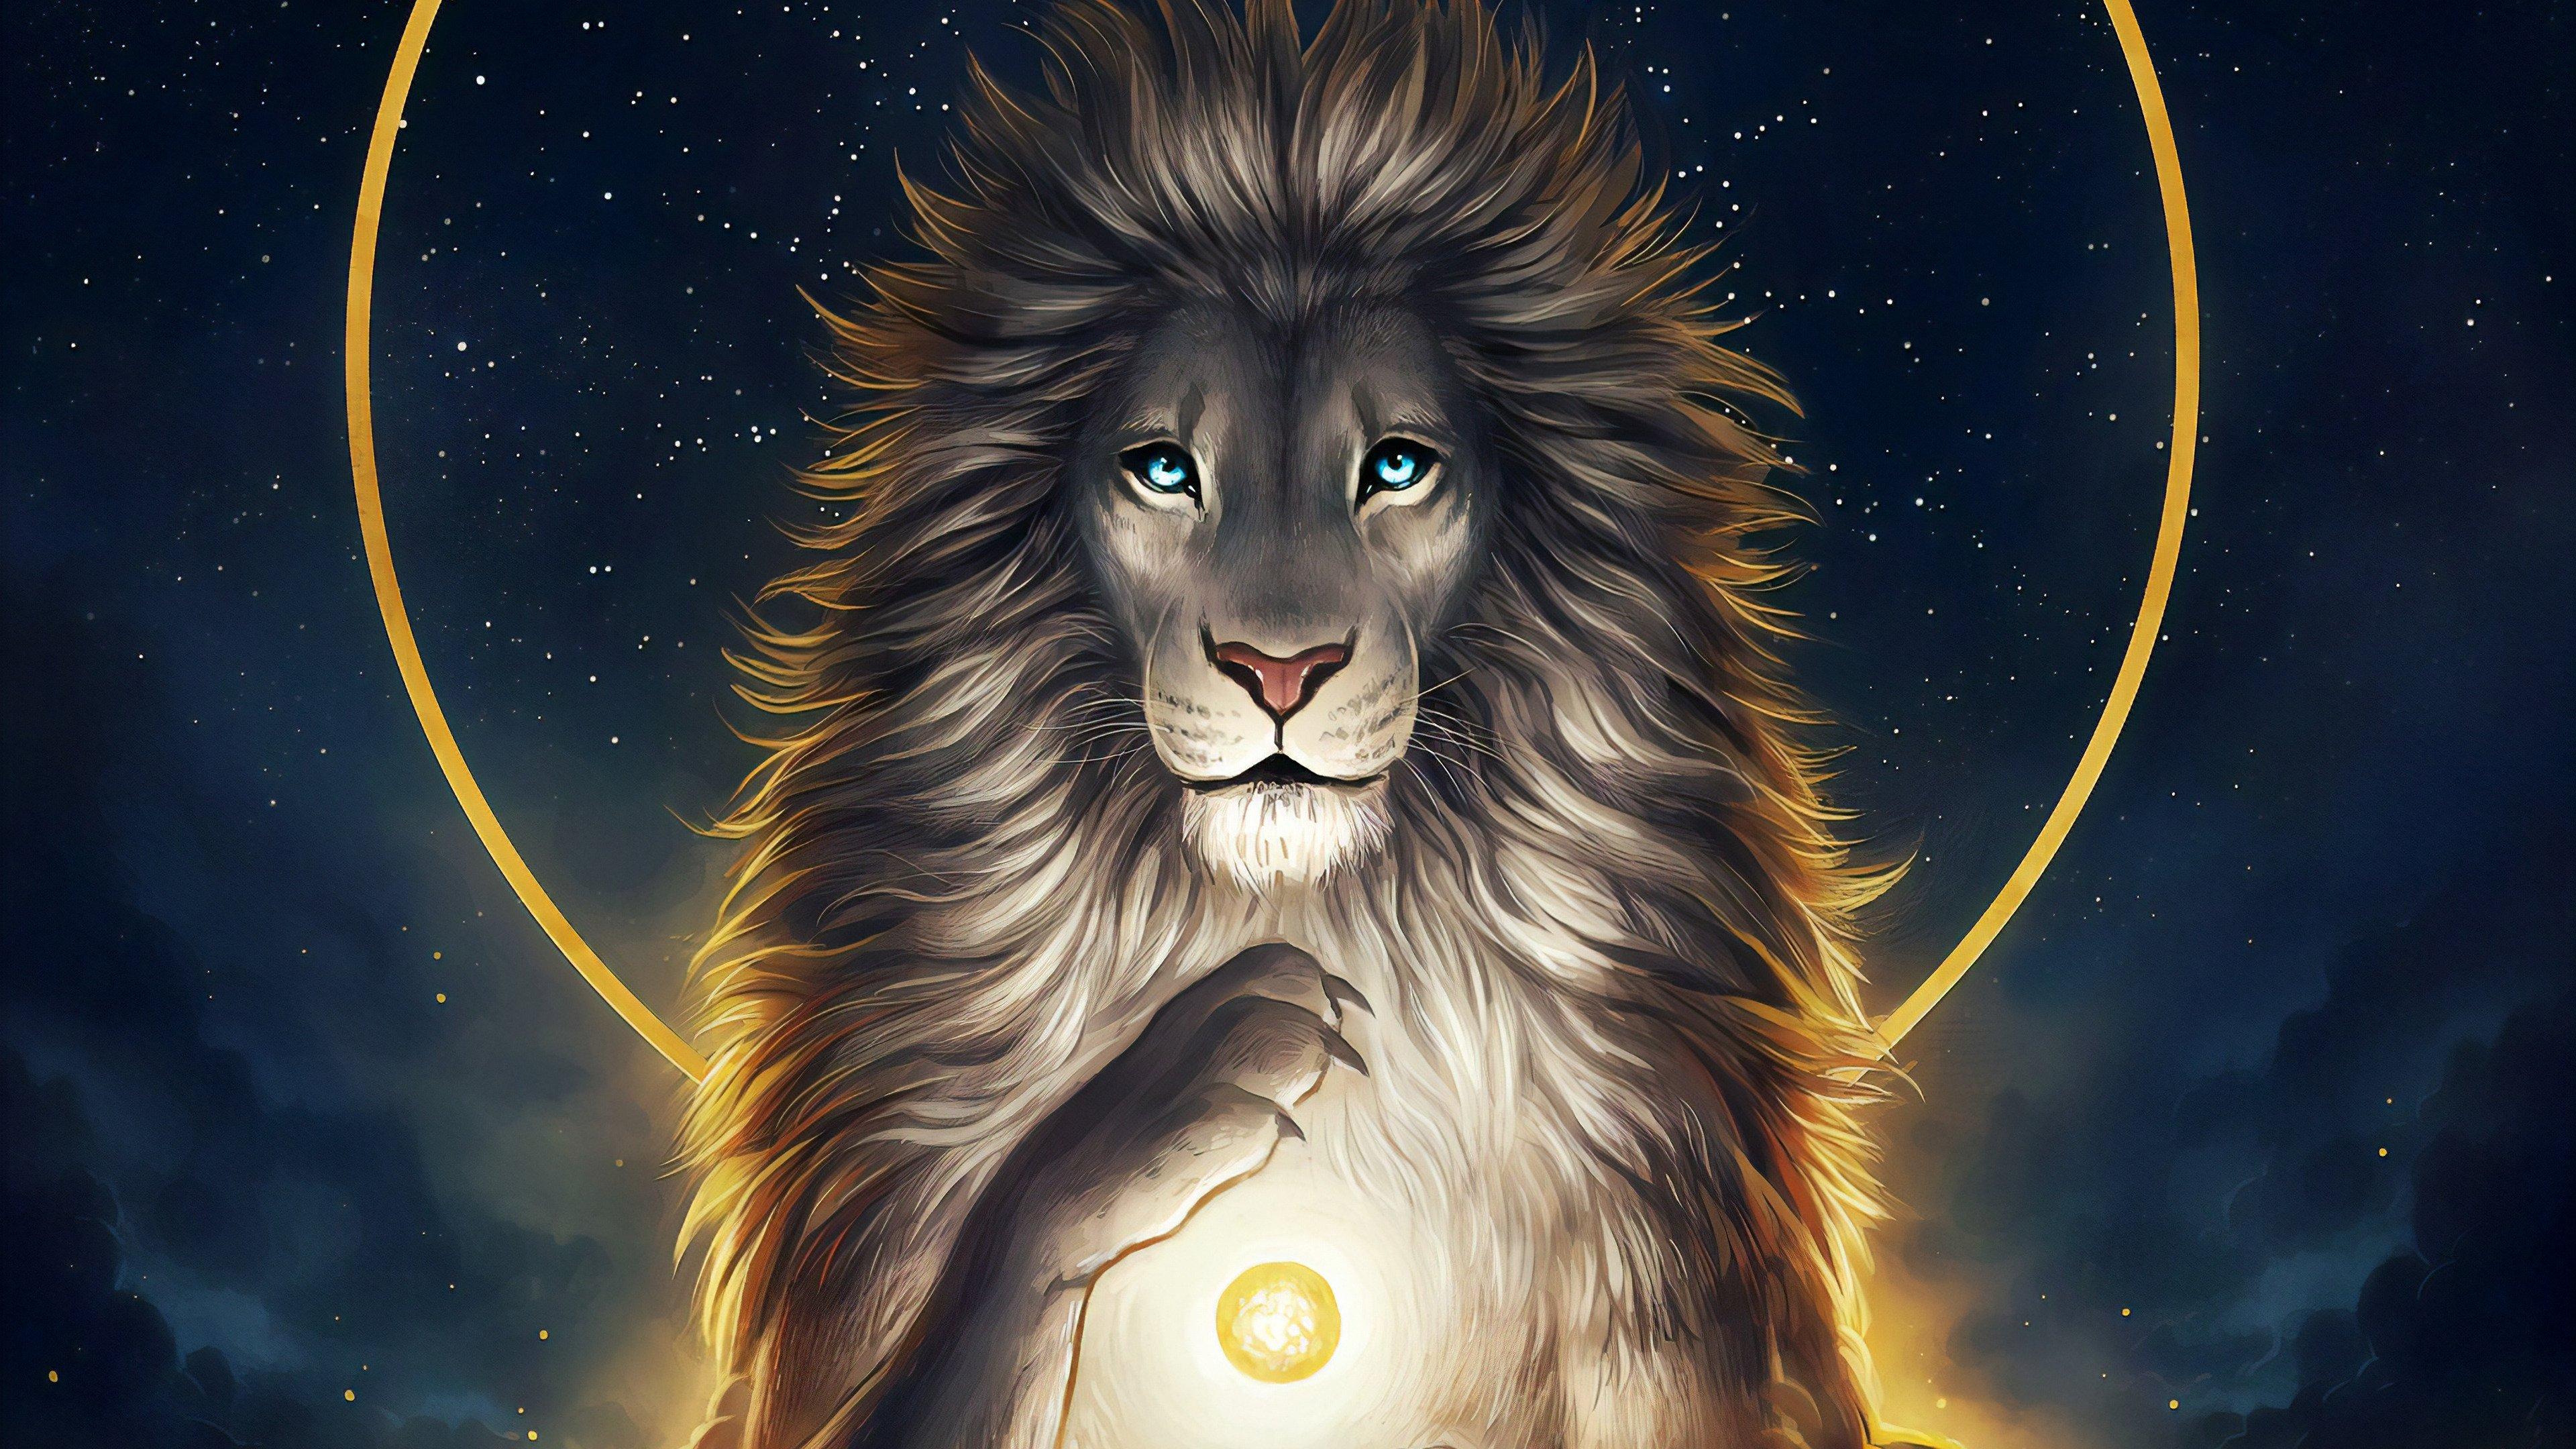 Wallpaper Lion Digital Art